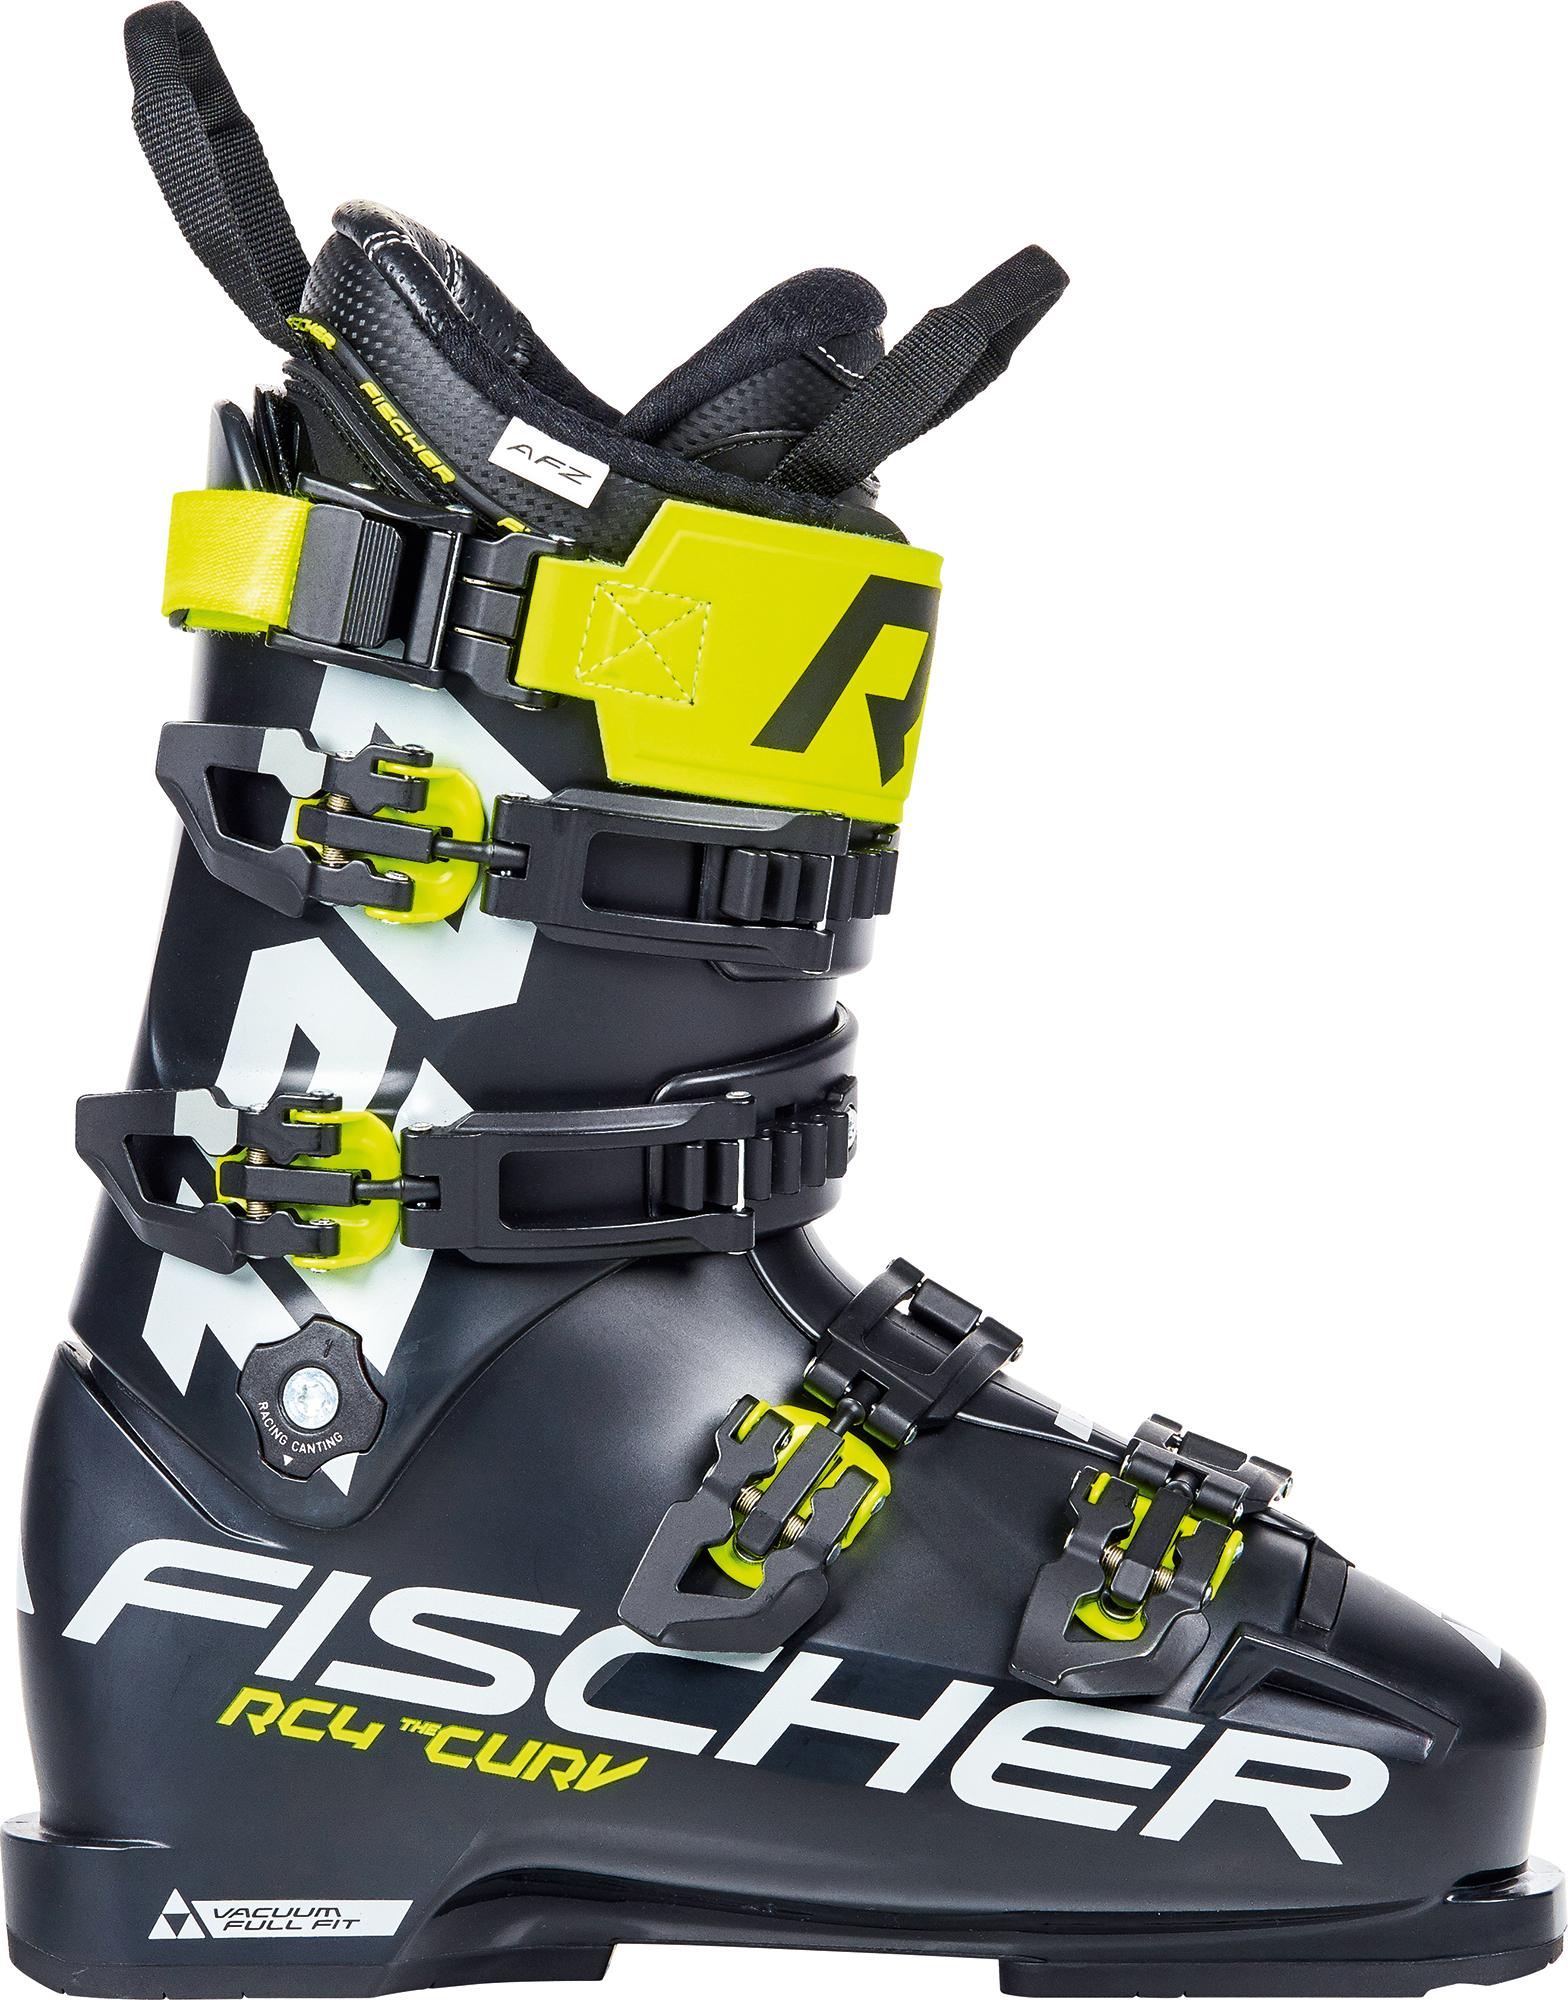 цена на Fischer Ботинки горнолыжные Fischer RC4 THE CURV 120 VFF, размер 29,5 см